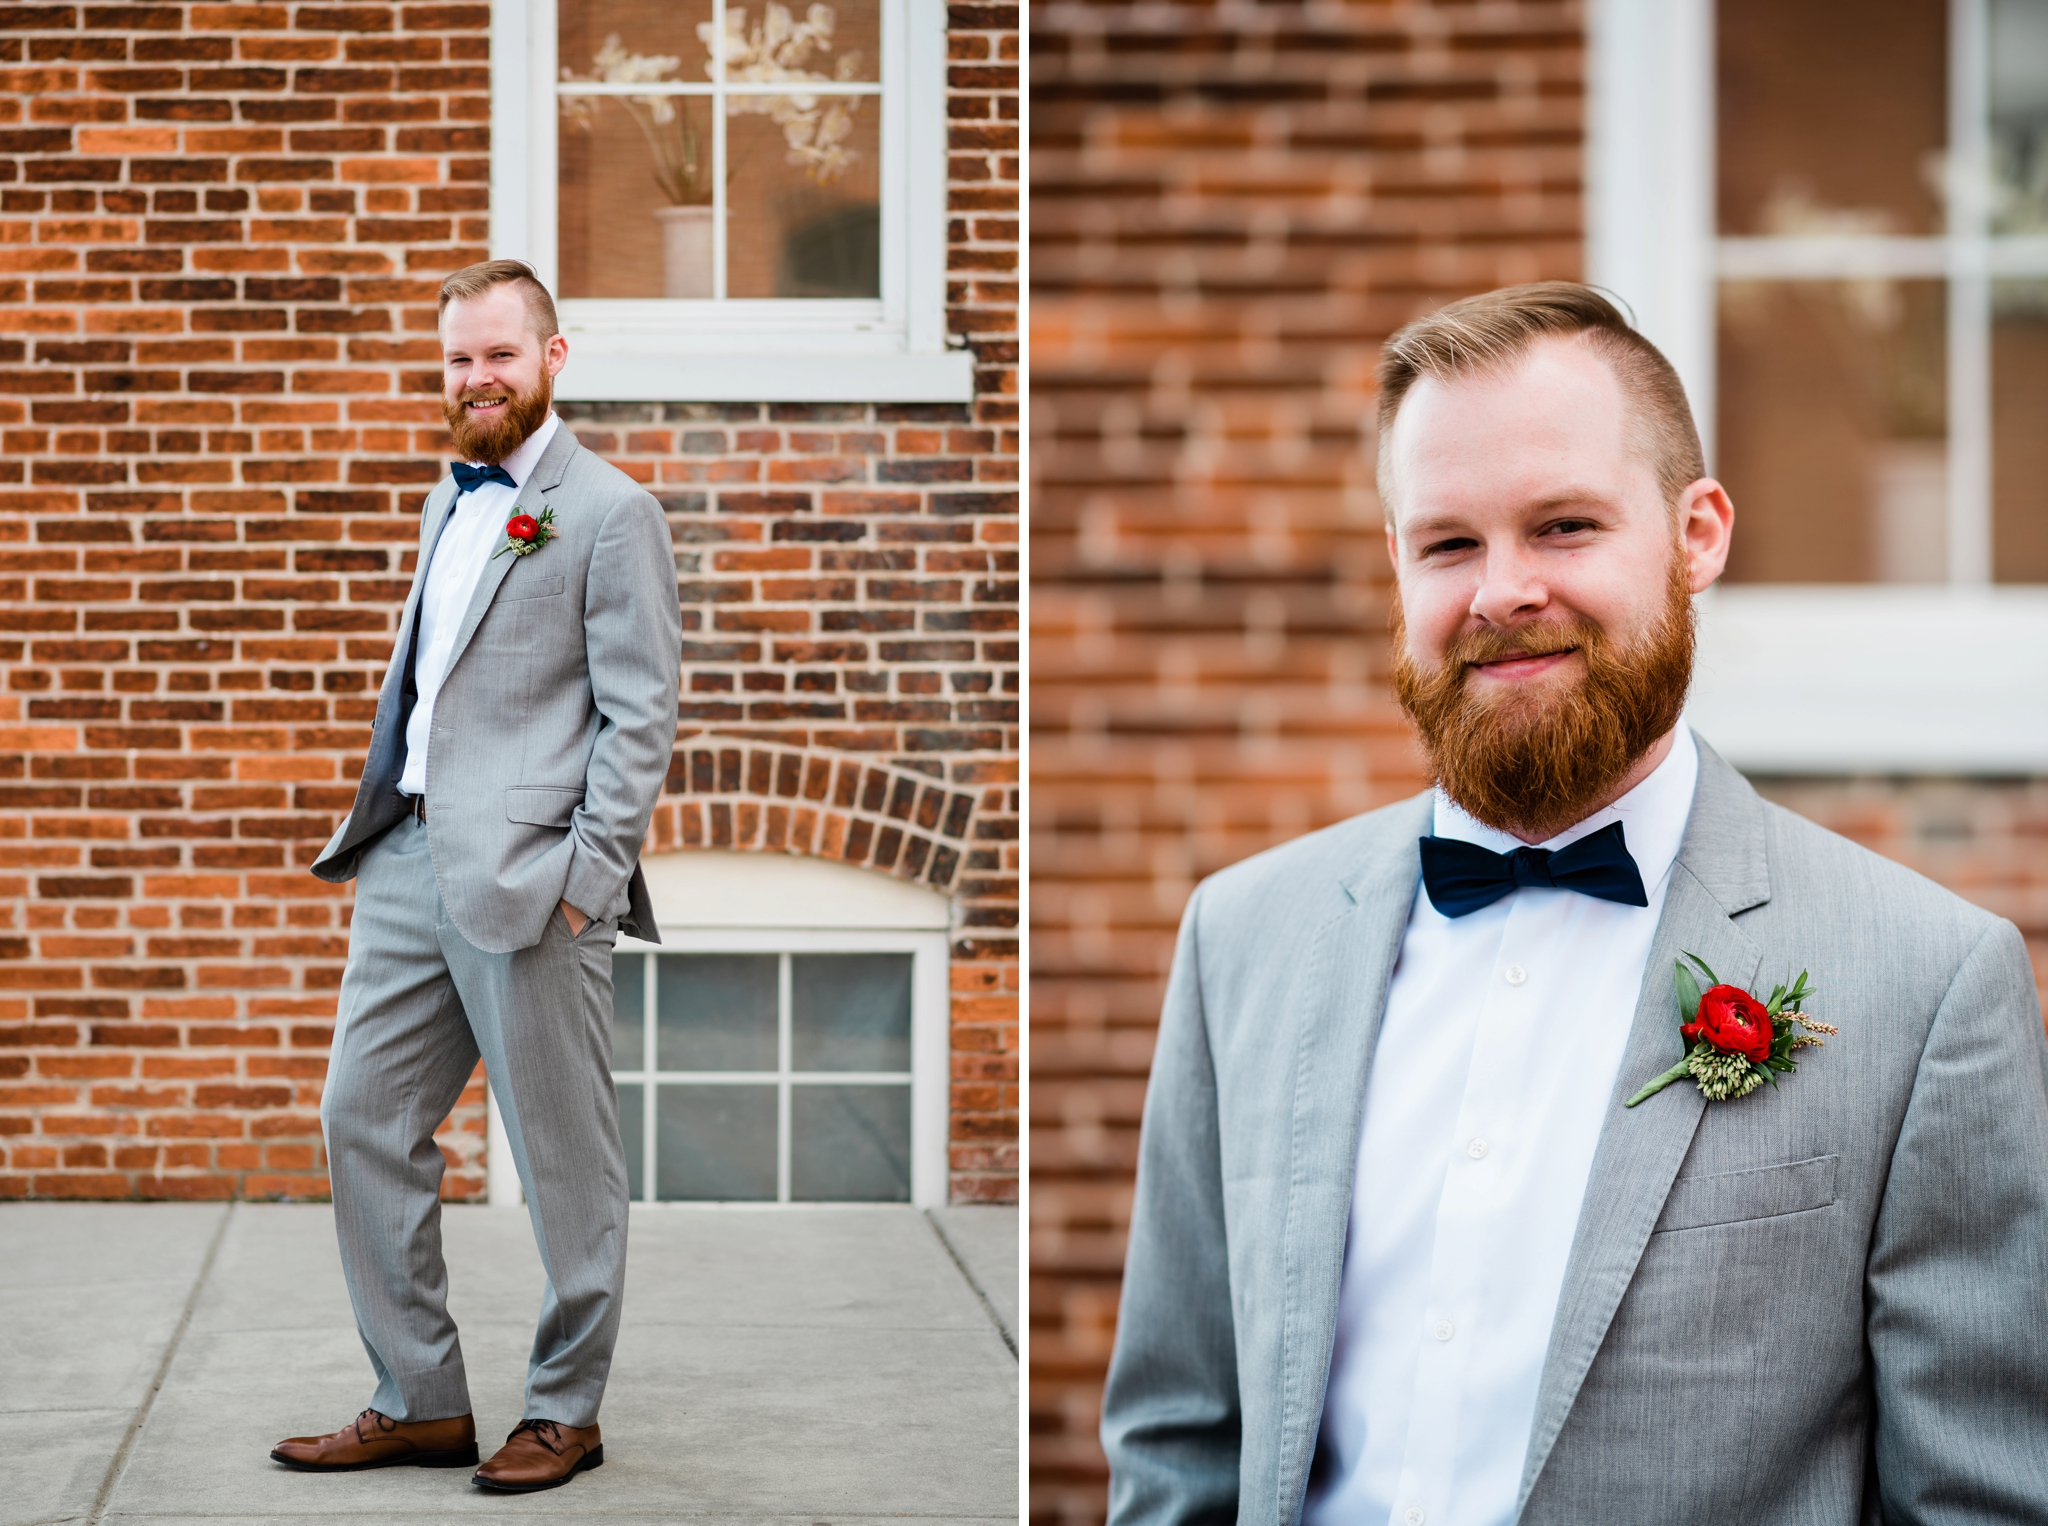 Emily Grace Photography, Lancaster PA Wedding Photographer, The Booking House Wedding Venue, Manheim PA Wedding Venue, The Booking House Manheim Groomsmen Photos, Central PA Wedding Photographer